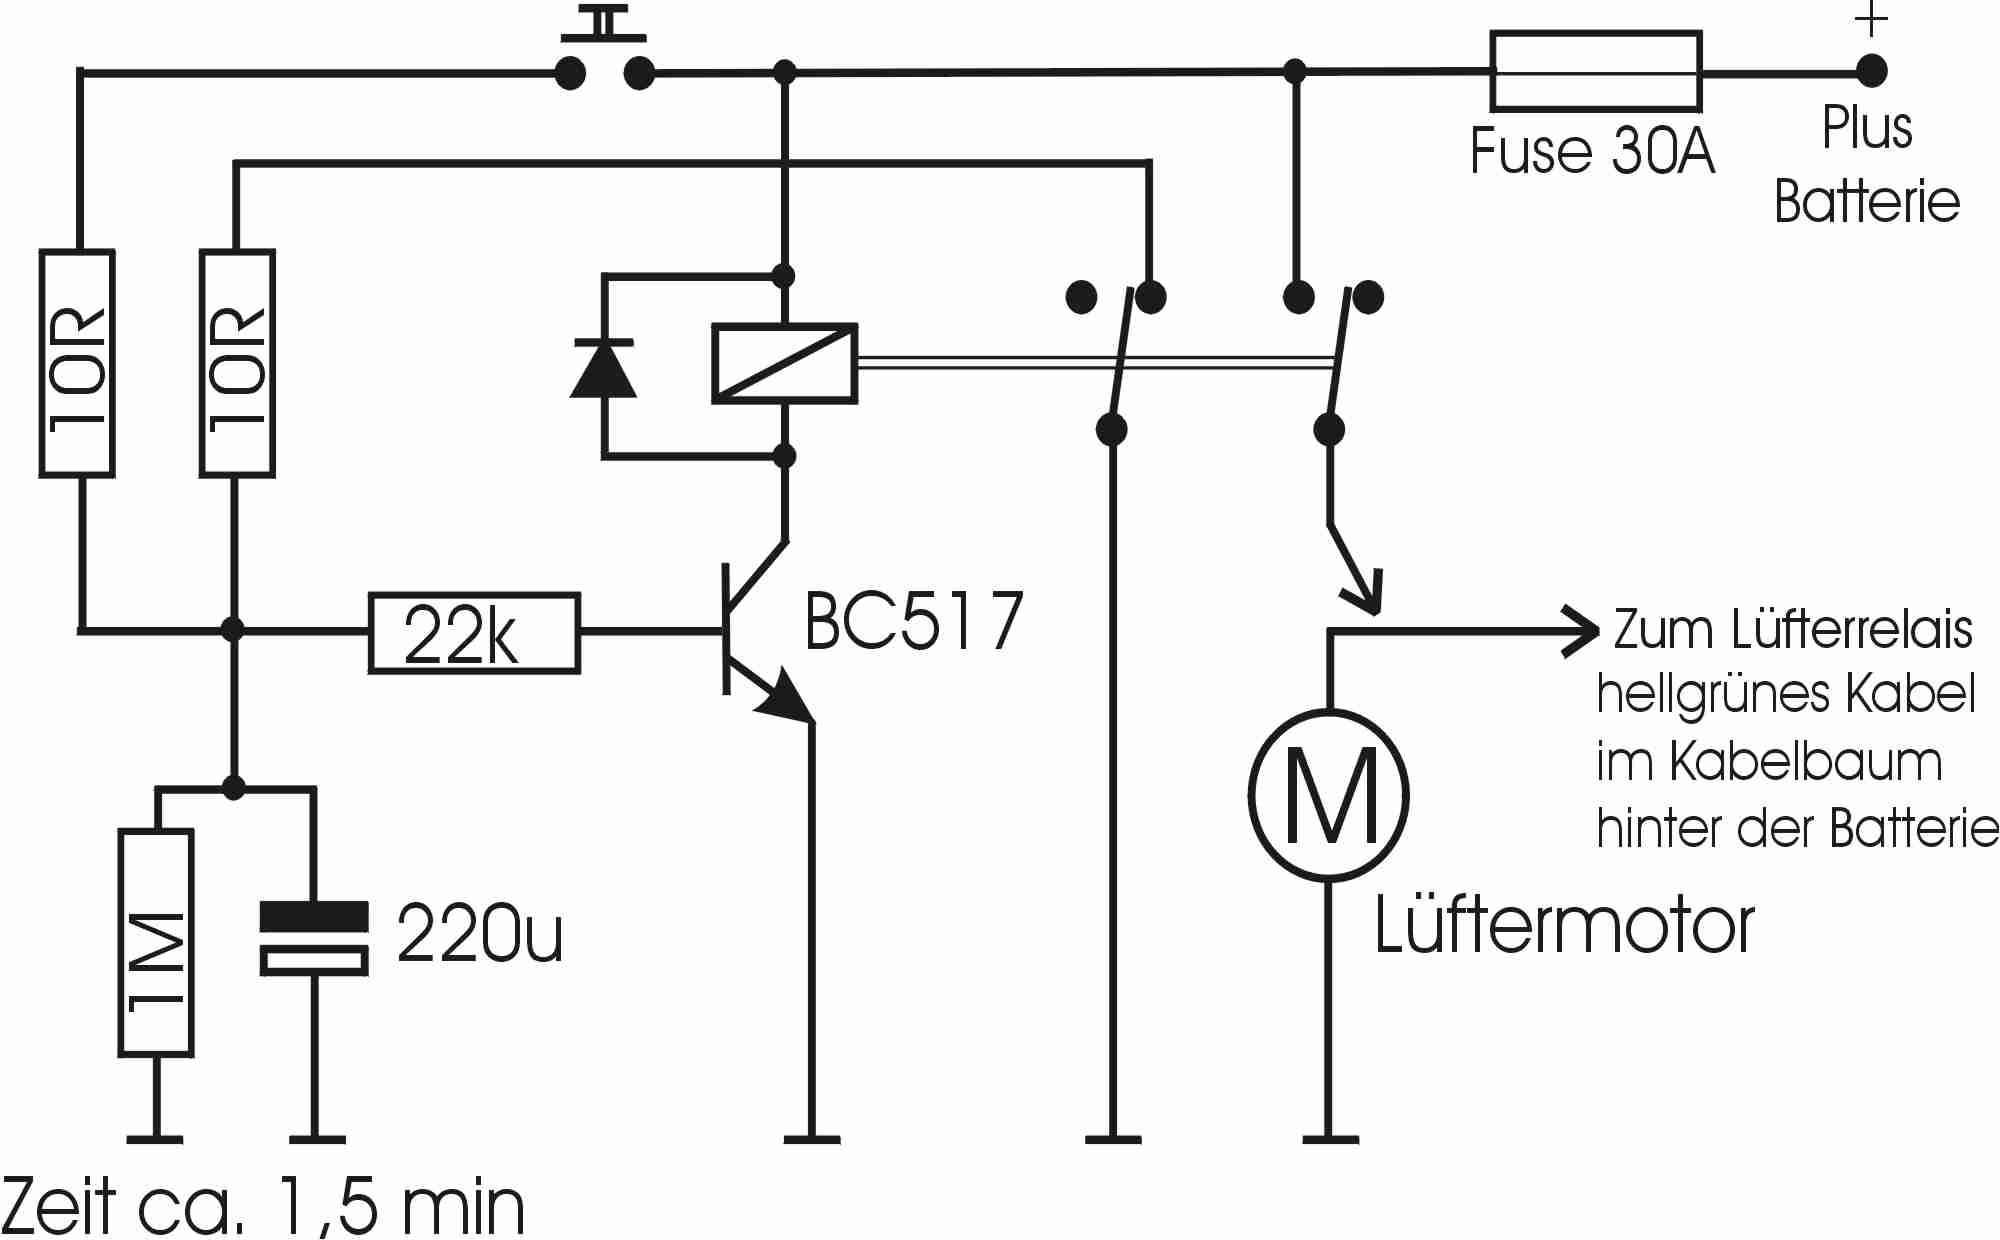 volvo t5 turbo wiring diagram database tags volvo xc60 turbo audi a4 turbo volvo turbo upgrade kit 2001 volvo v70 t5 volvo s40 t5 volvo s70 t5 2013 volvo s60 t5 ford focus turbo 2002 volvo s60